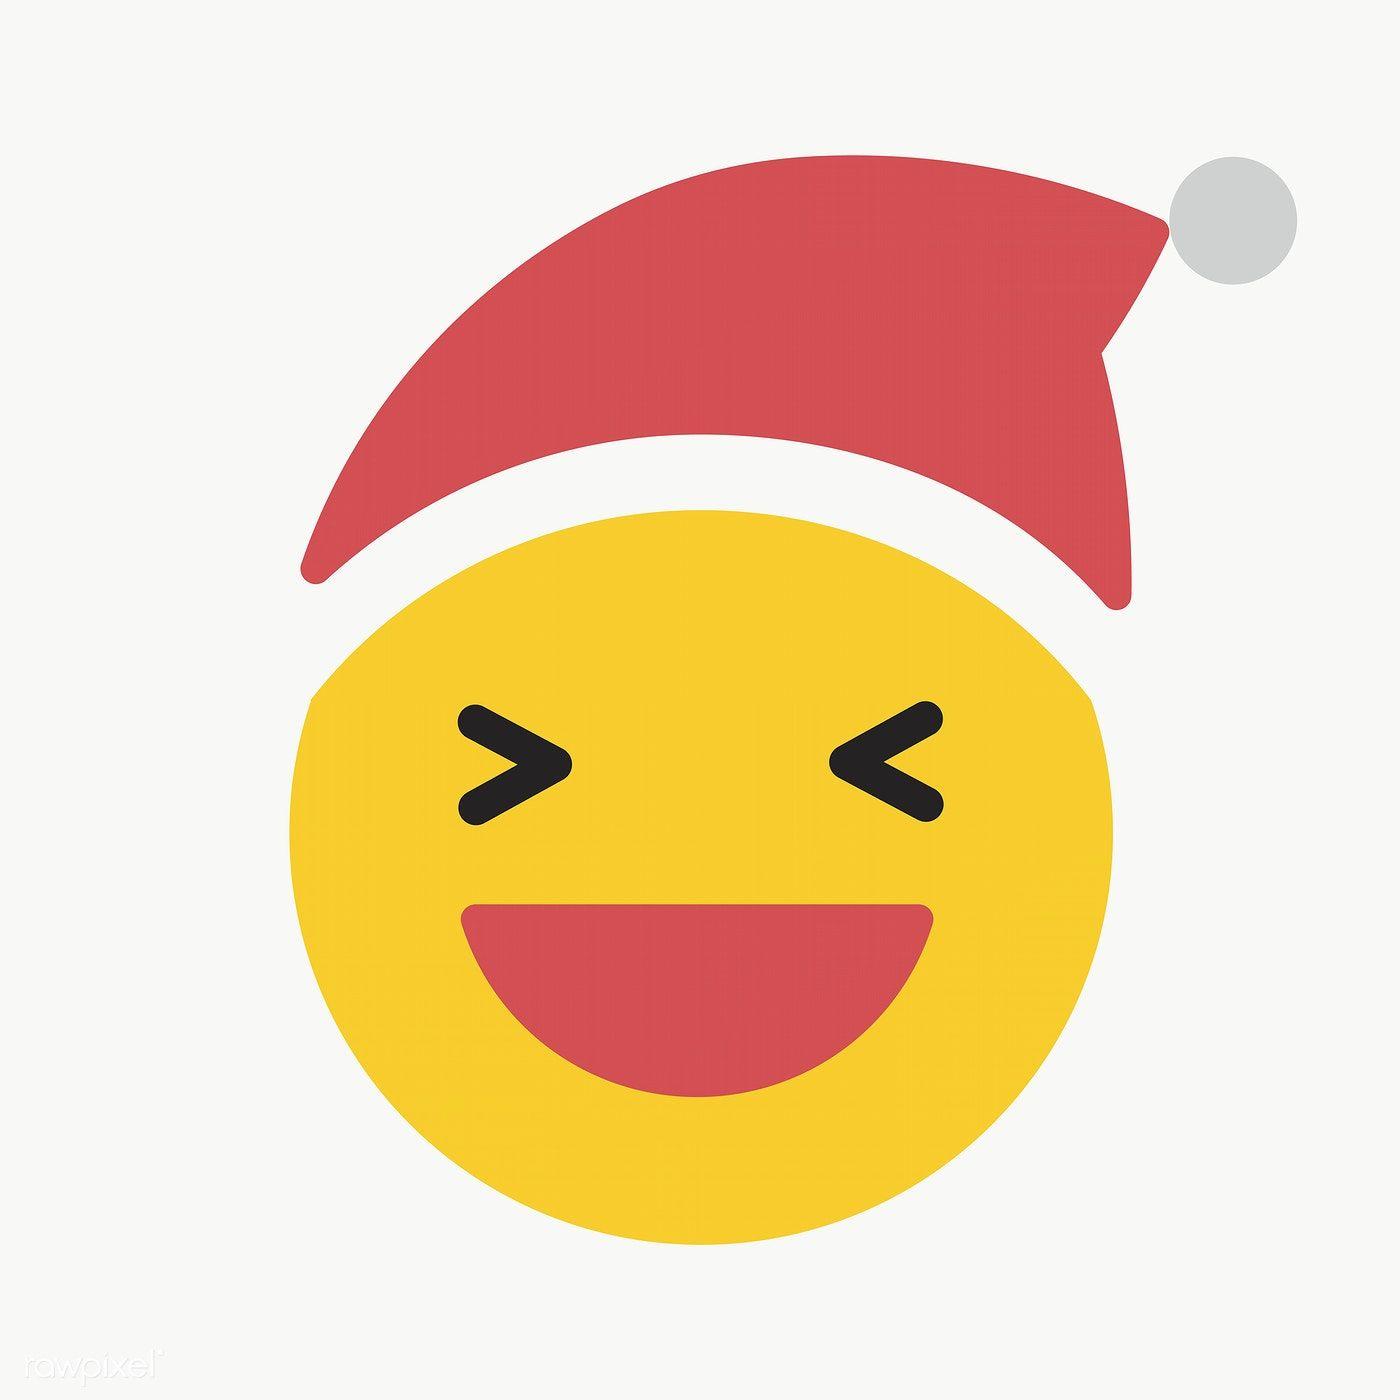 Download Premium Png Of Round Yellow Santa Slightly Smiling Emoticon On Hand Sticker Vector Background Pattern Emoticon